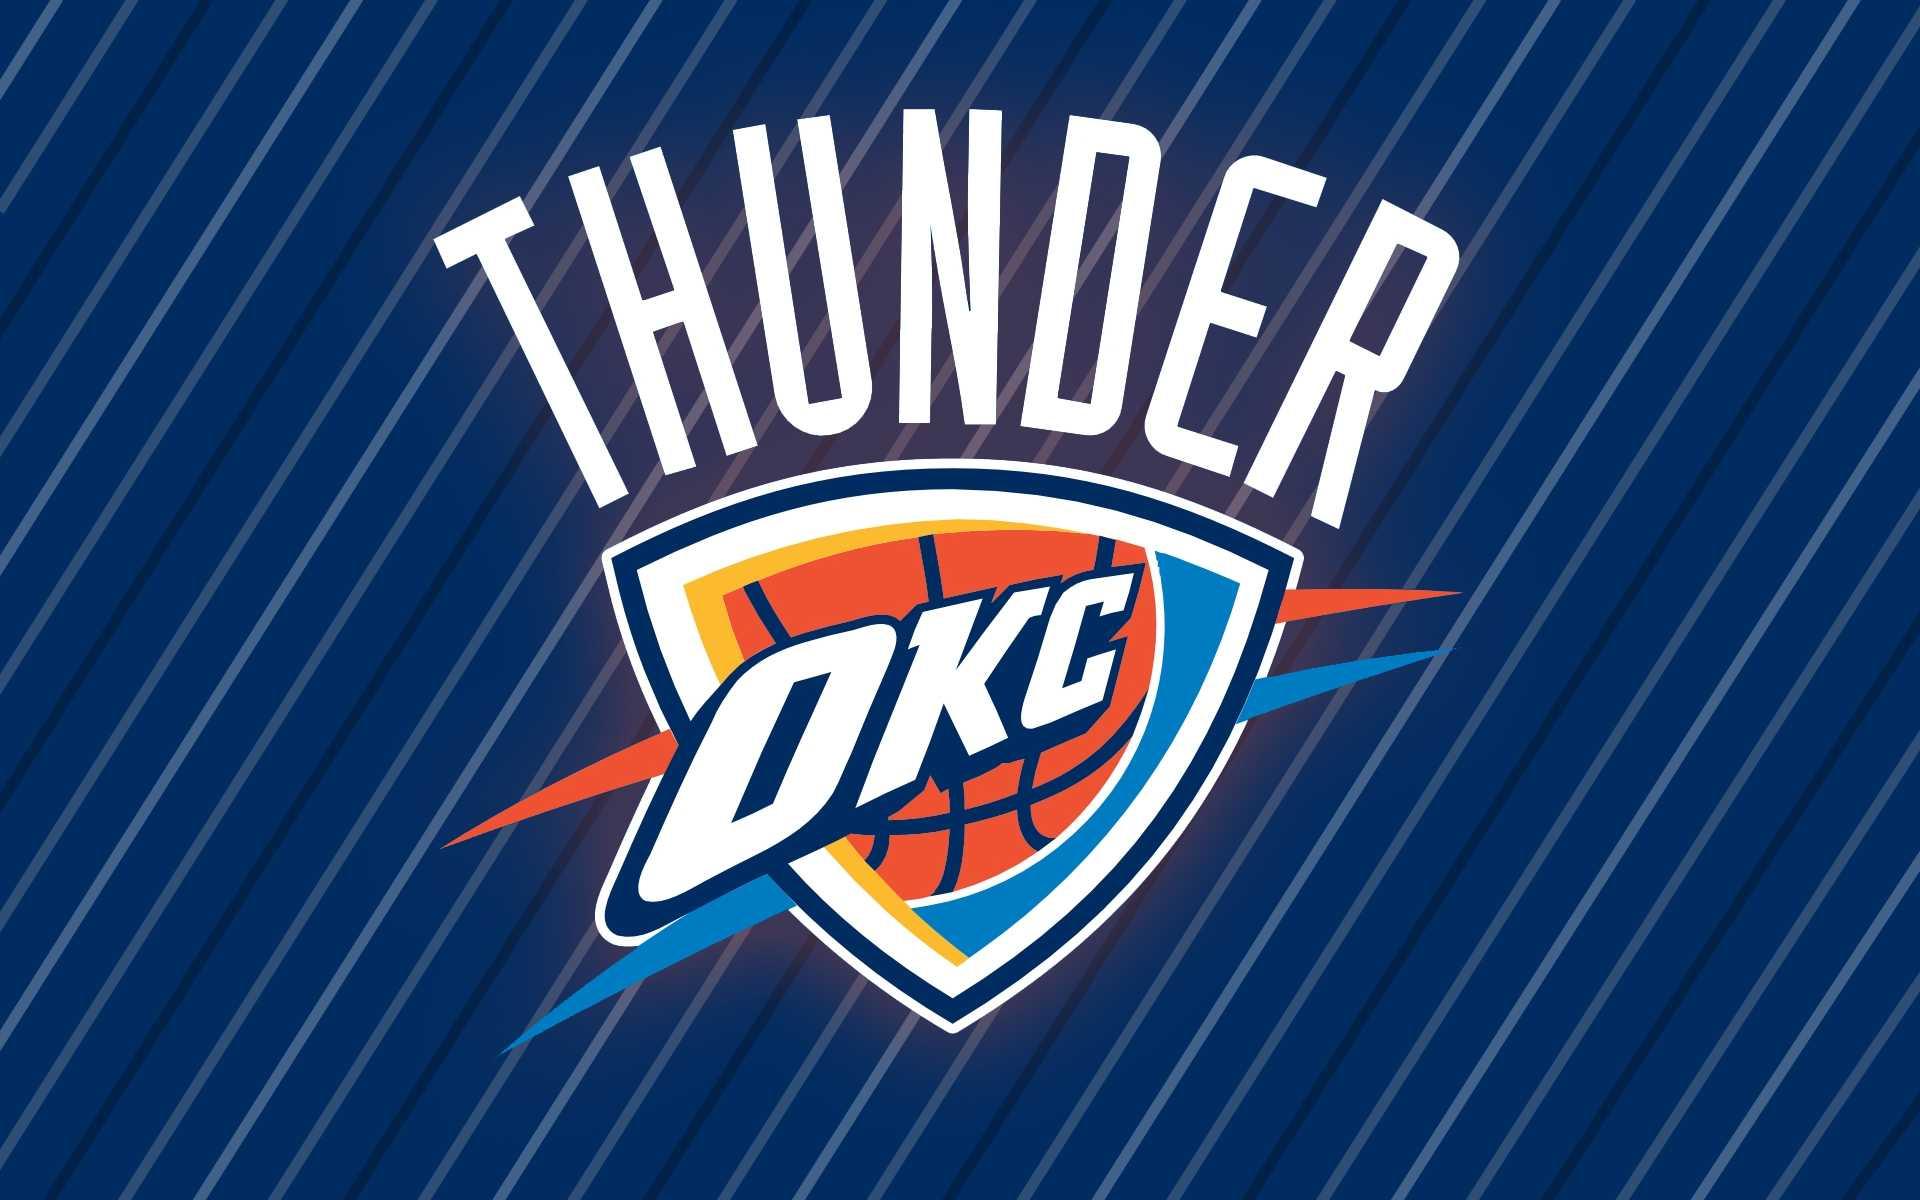 Oklahoma City Thunder 2018 Wallpapers - Wallpaper Cave